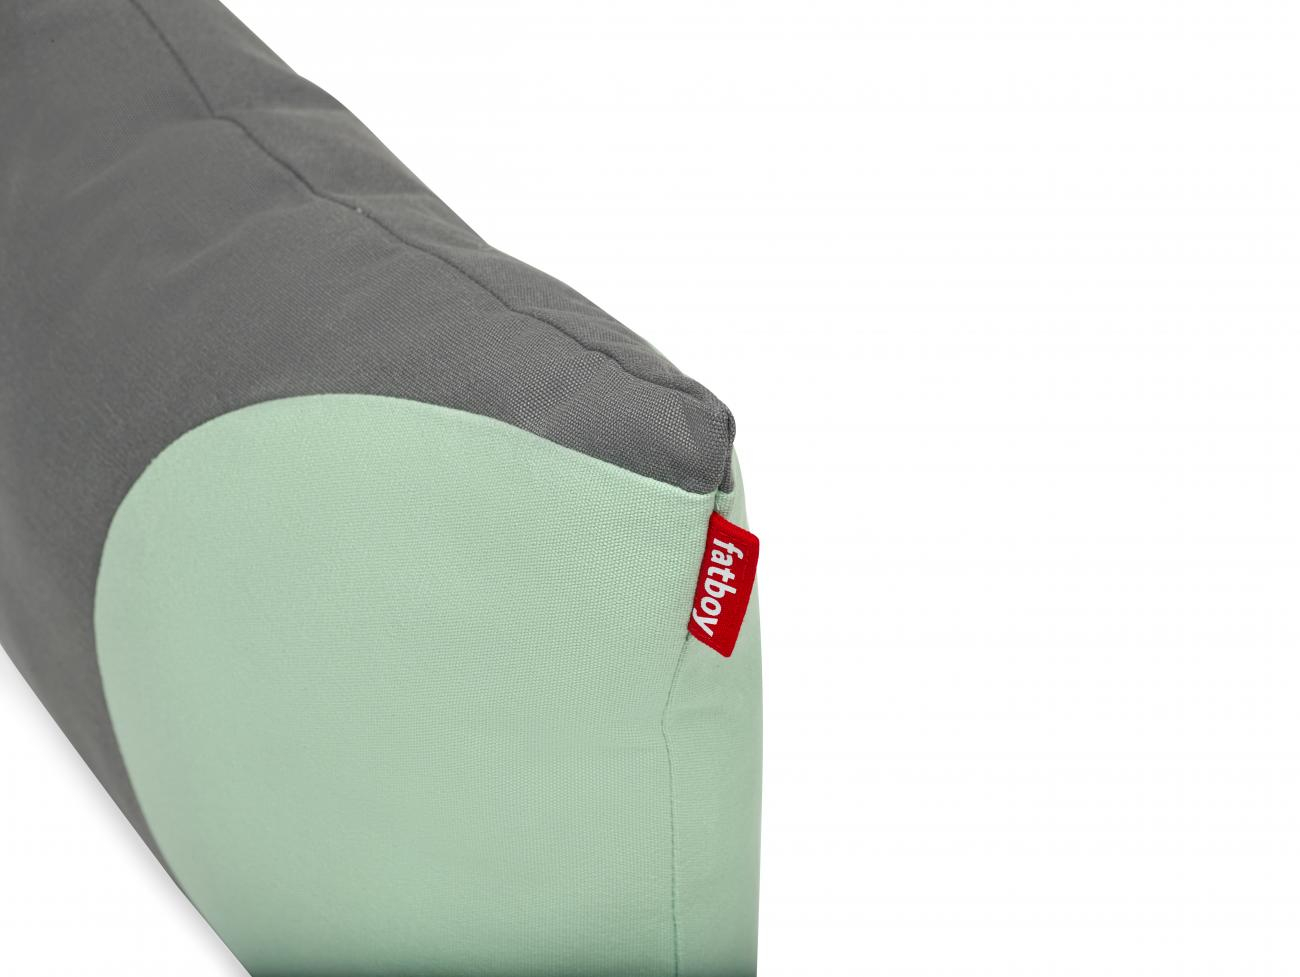 https://www.fundesign.nl/media/catalog/product/f/a/fatboy_pop-pillow_matcha_side_srgb.jpg